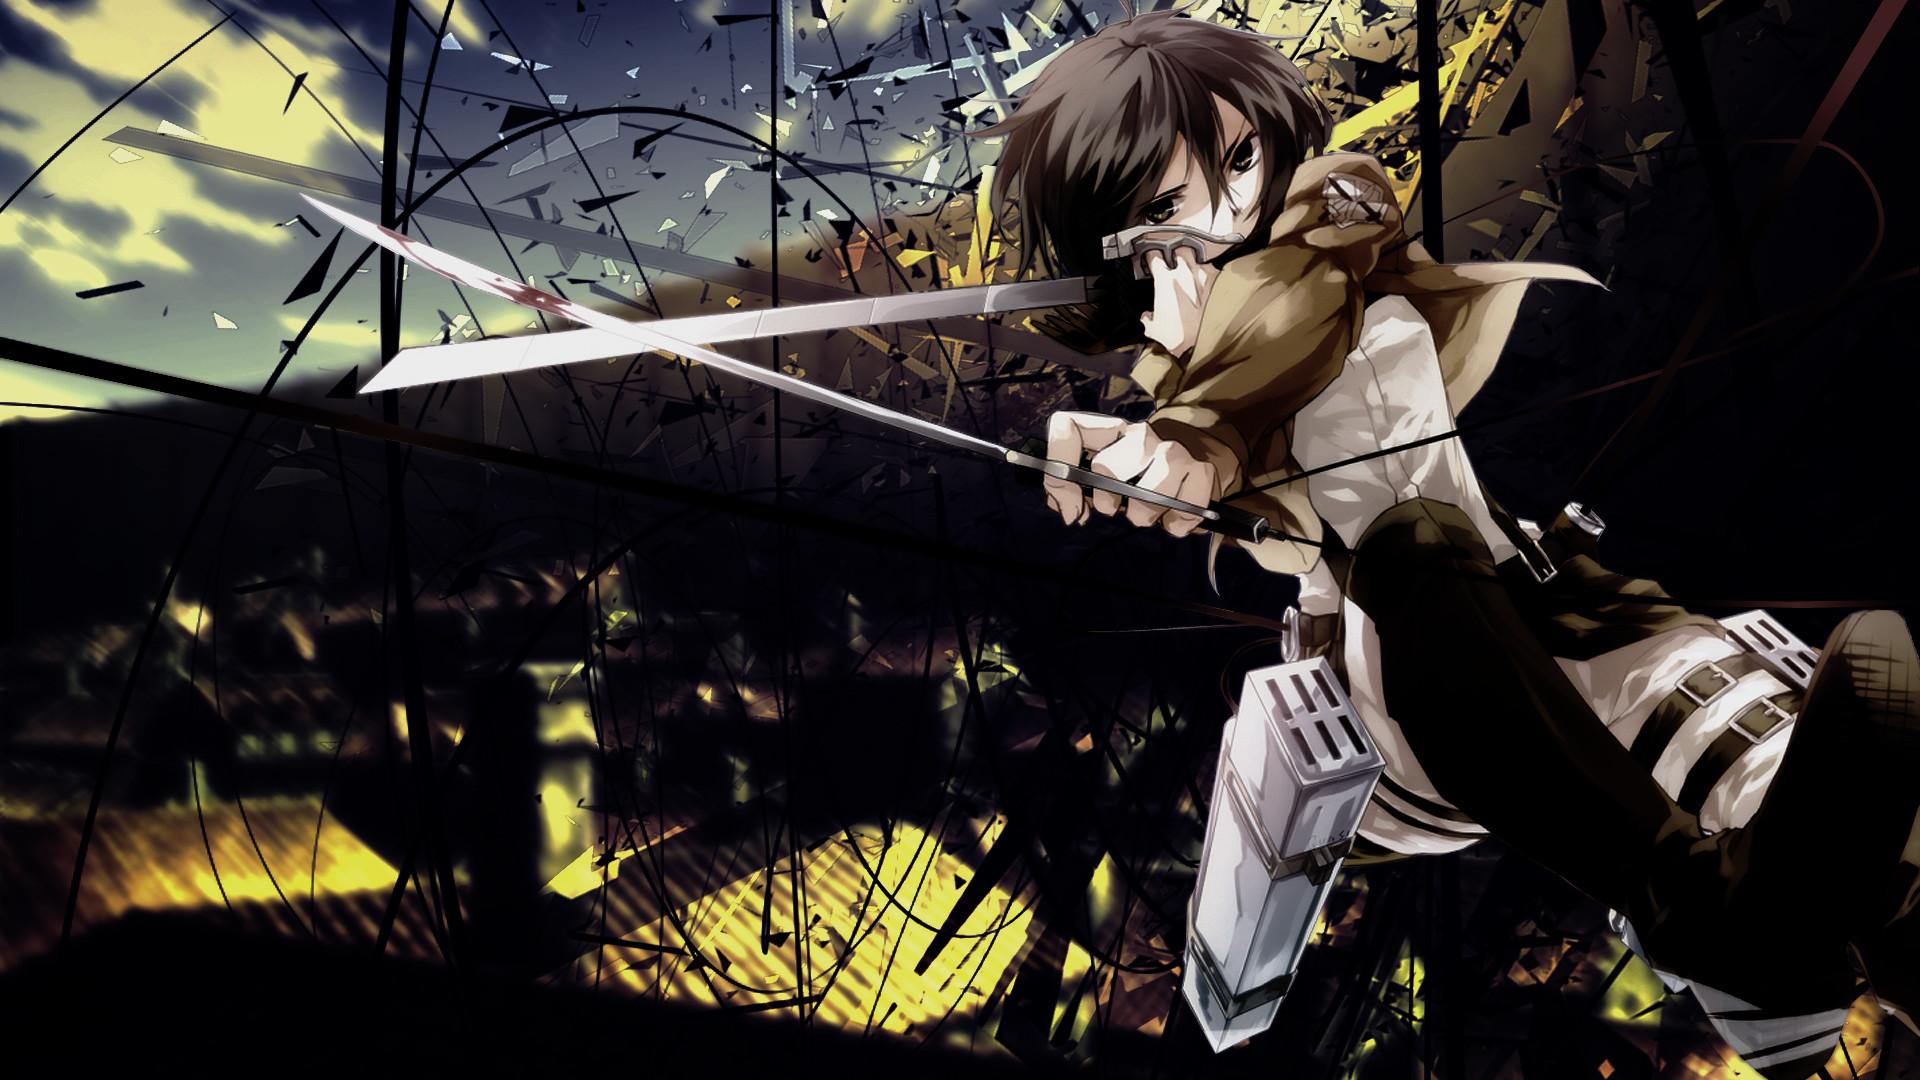 Gallery For > Attack On Titan Wallpaper Mikasa